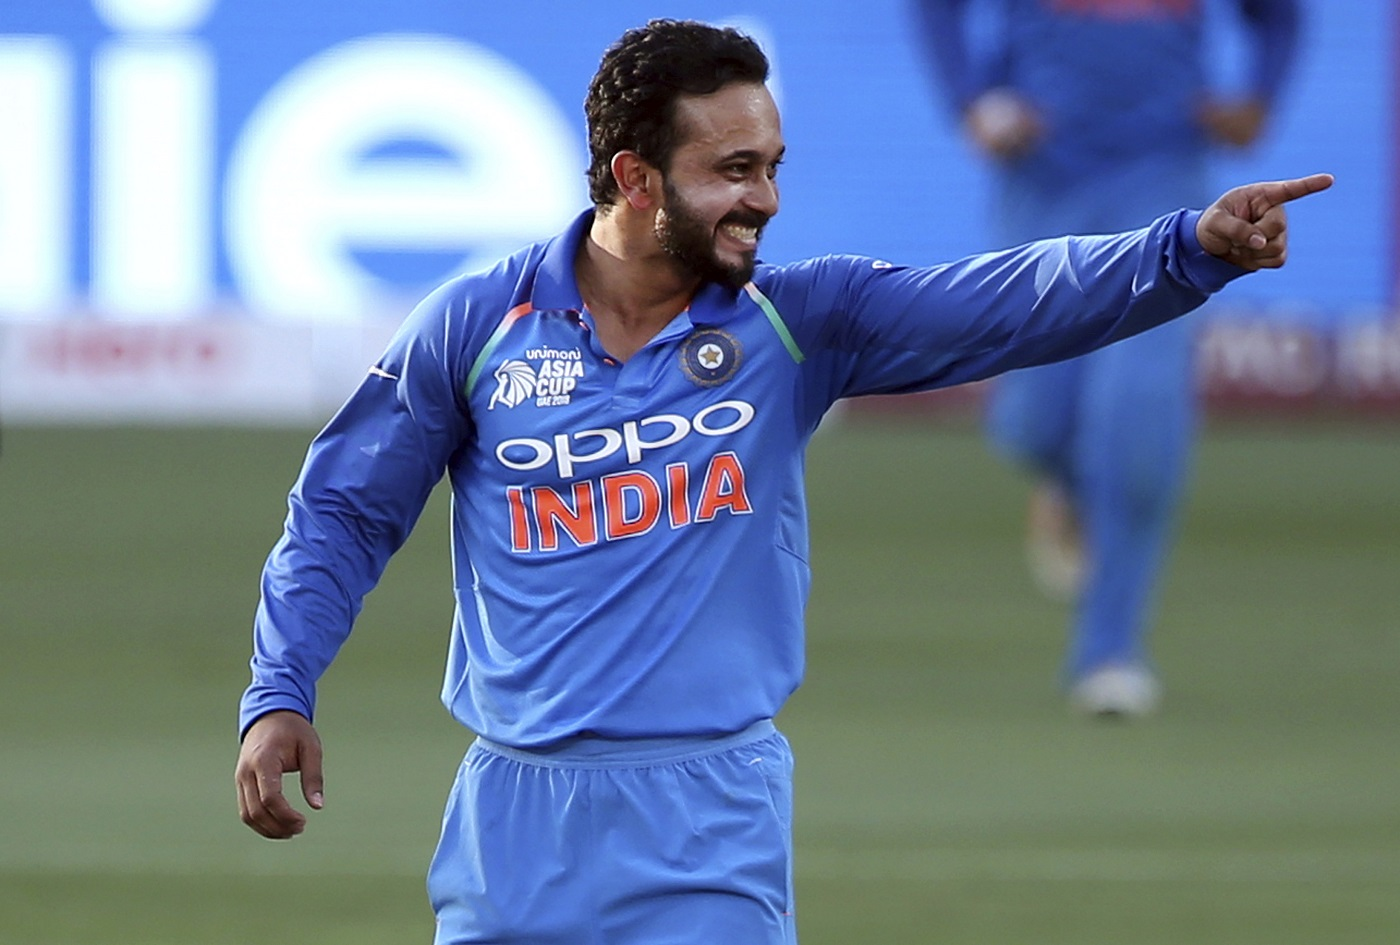 Kedar Jadhav is overjoyed after he gets a wicket Associated Press